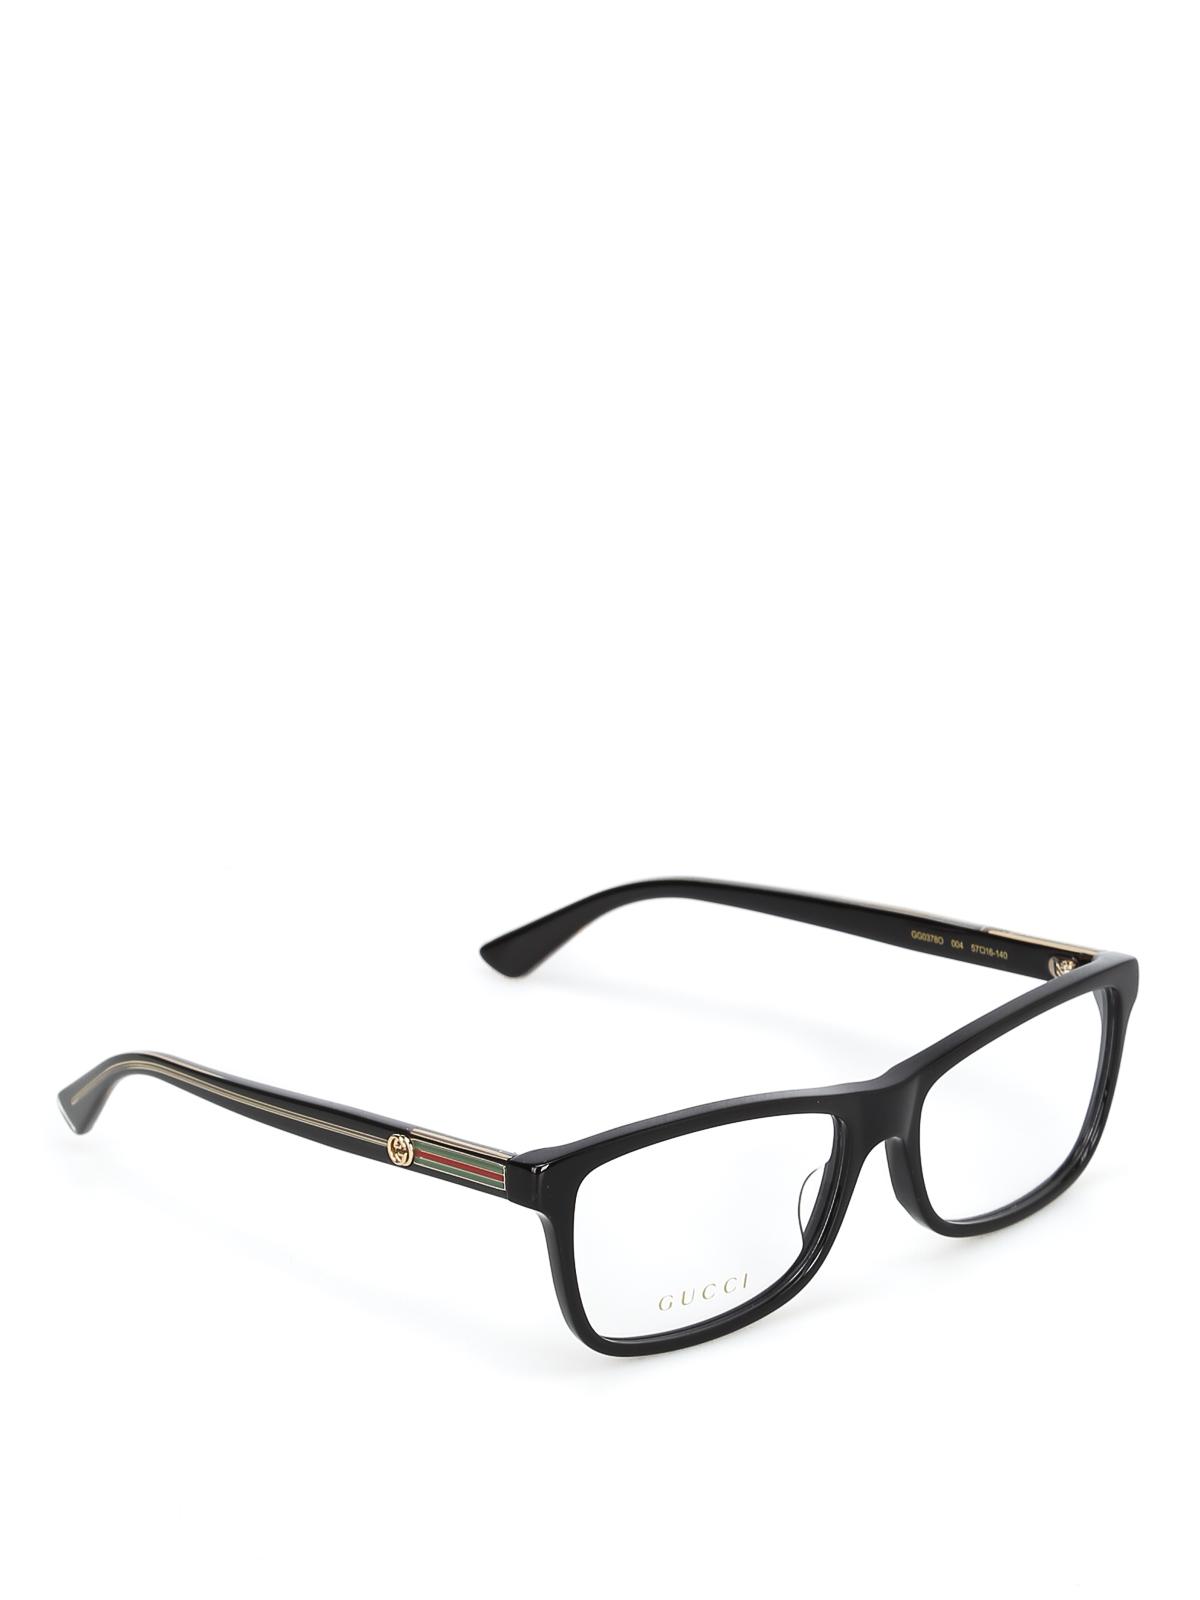 f6047acd499f4 Gucci - Acetate black eyeglasses with golden details - glasses ...